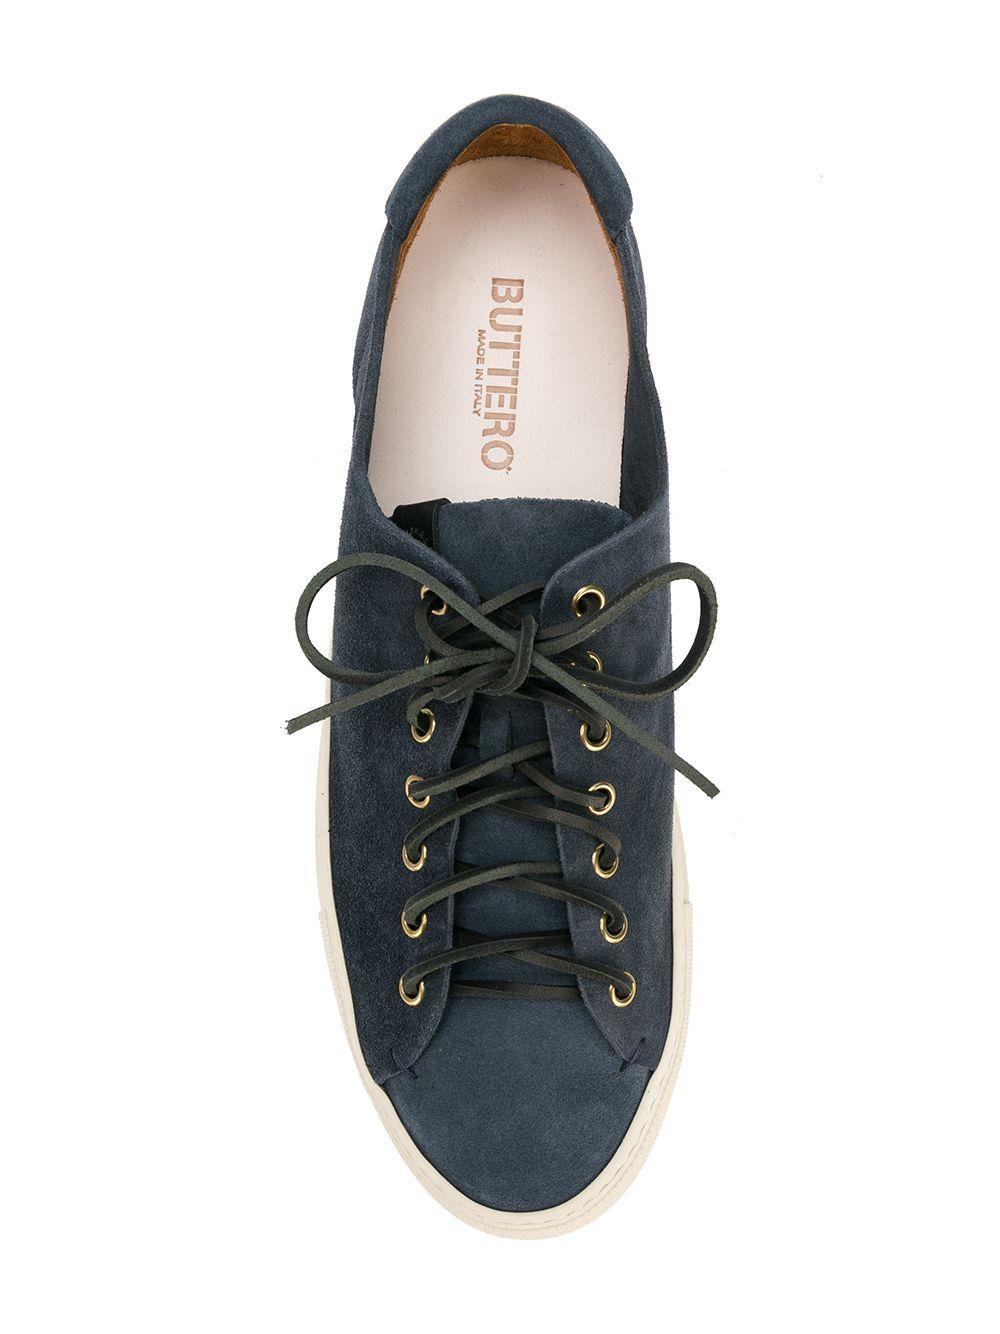 Ttatino sneakers man BUTTERO   Sneakers   B4020GORH-UGTEMPESTA